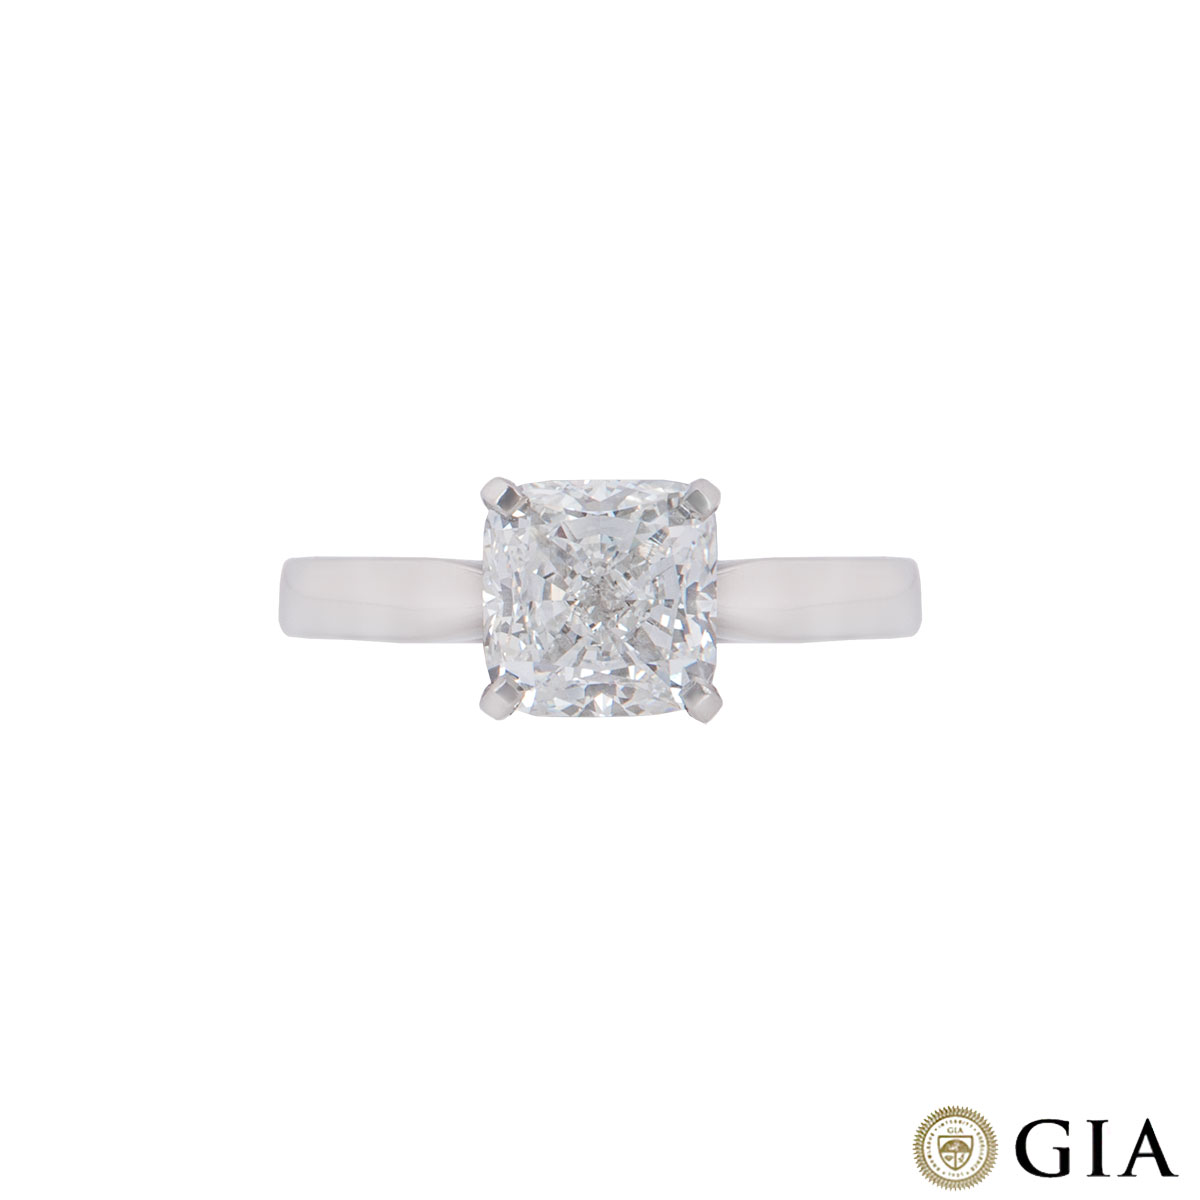 Platinum Cushion Cut Diamond Ring 2.07ct H/VVS2